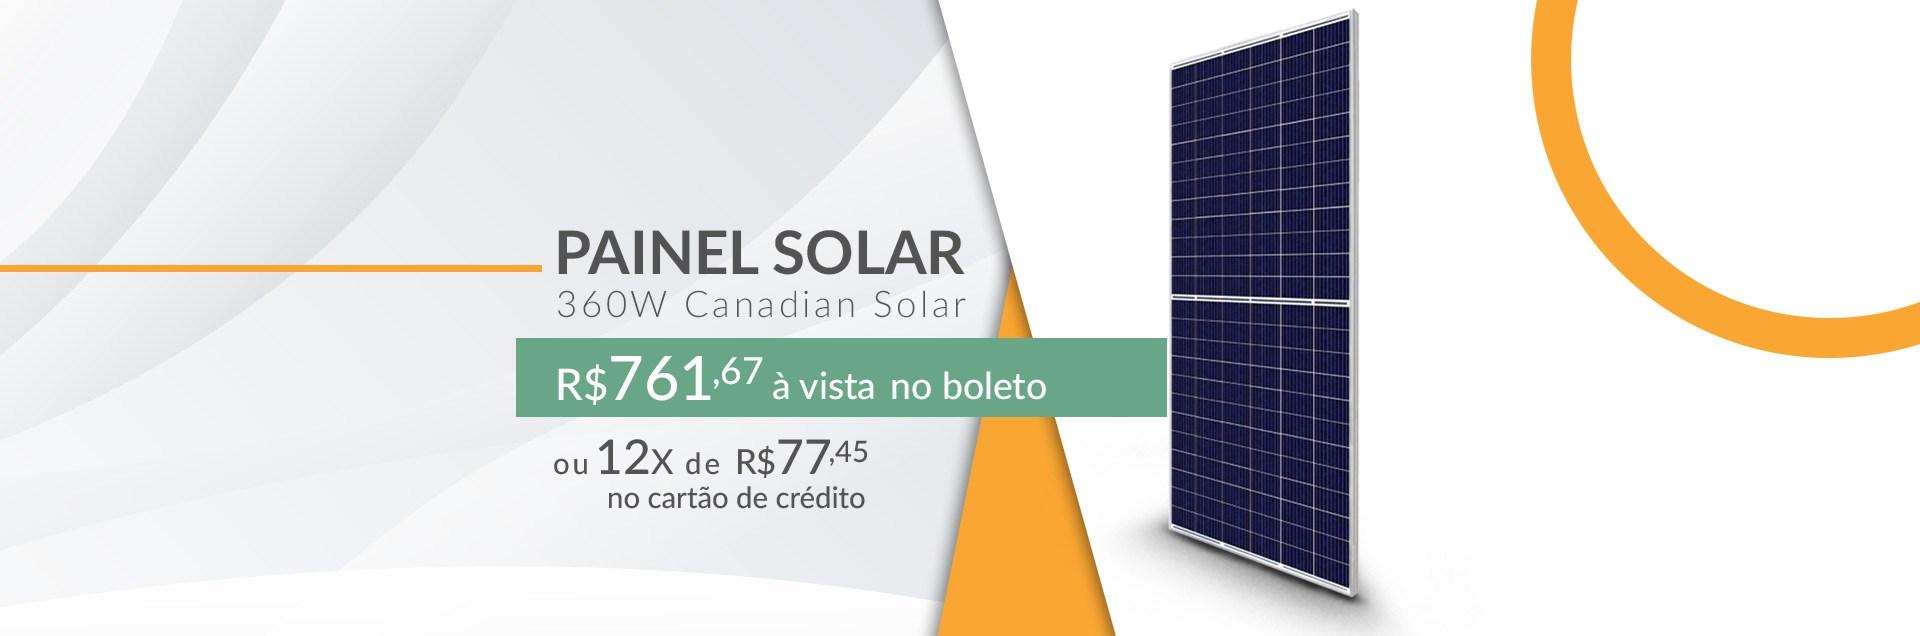 Painel Solar 360W Canadian Solar